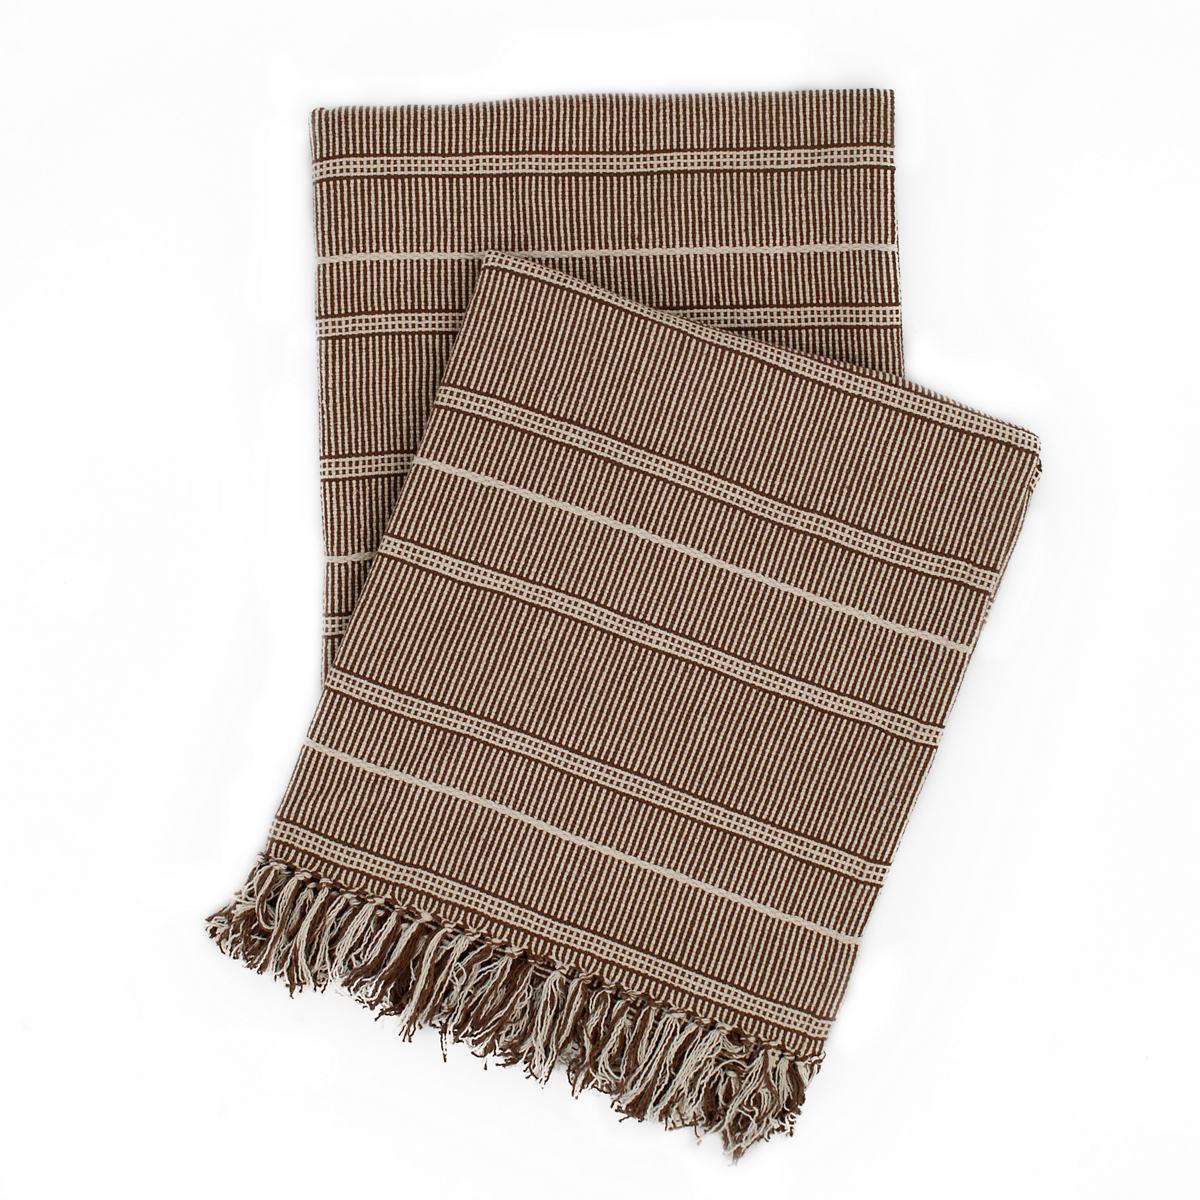 Samson Oak Woven Cotton Throw